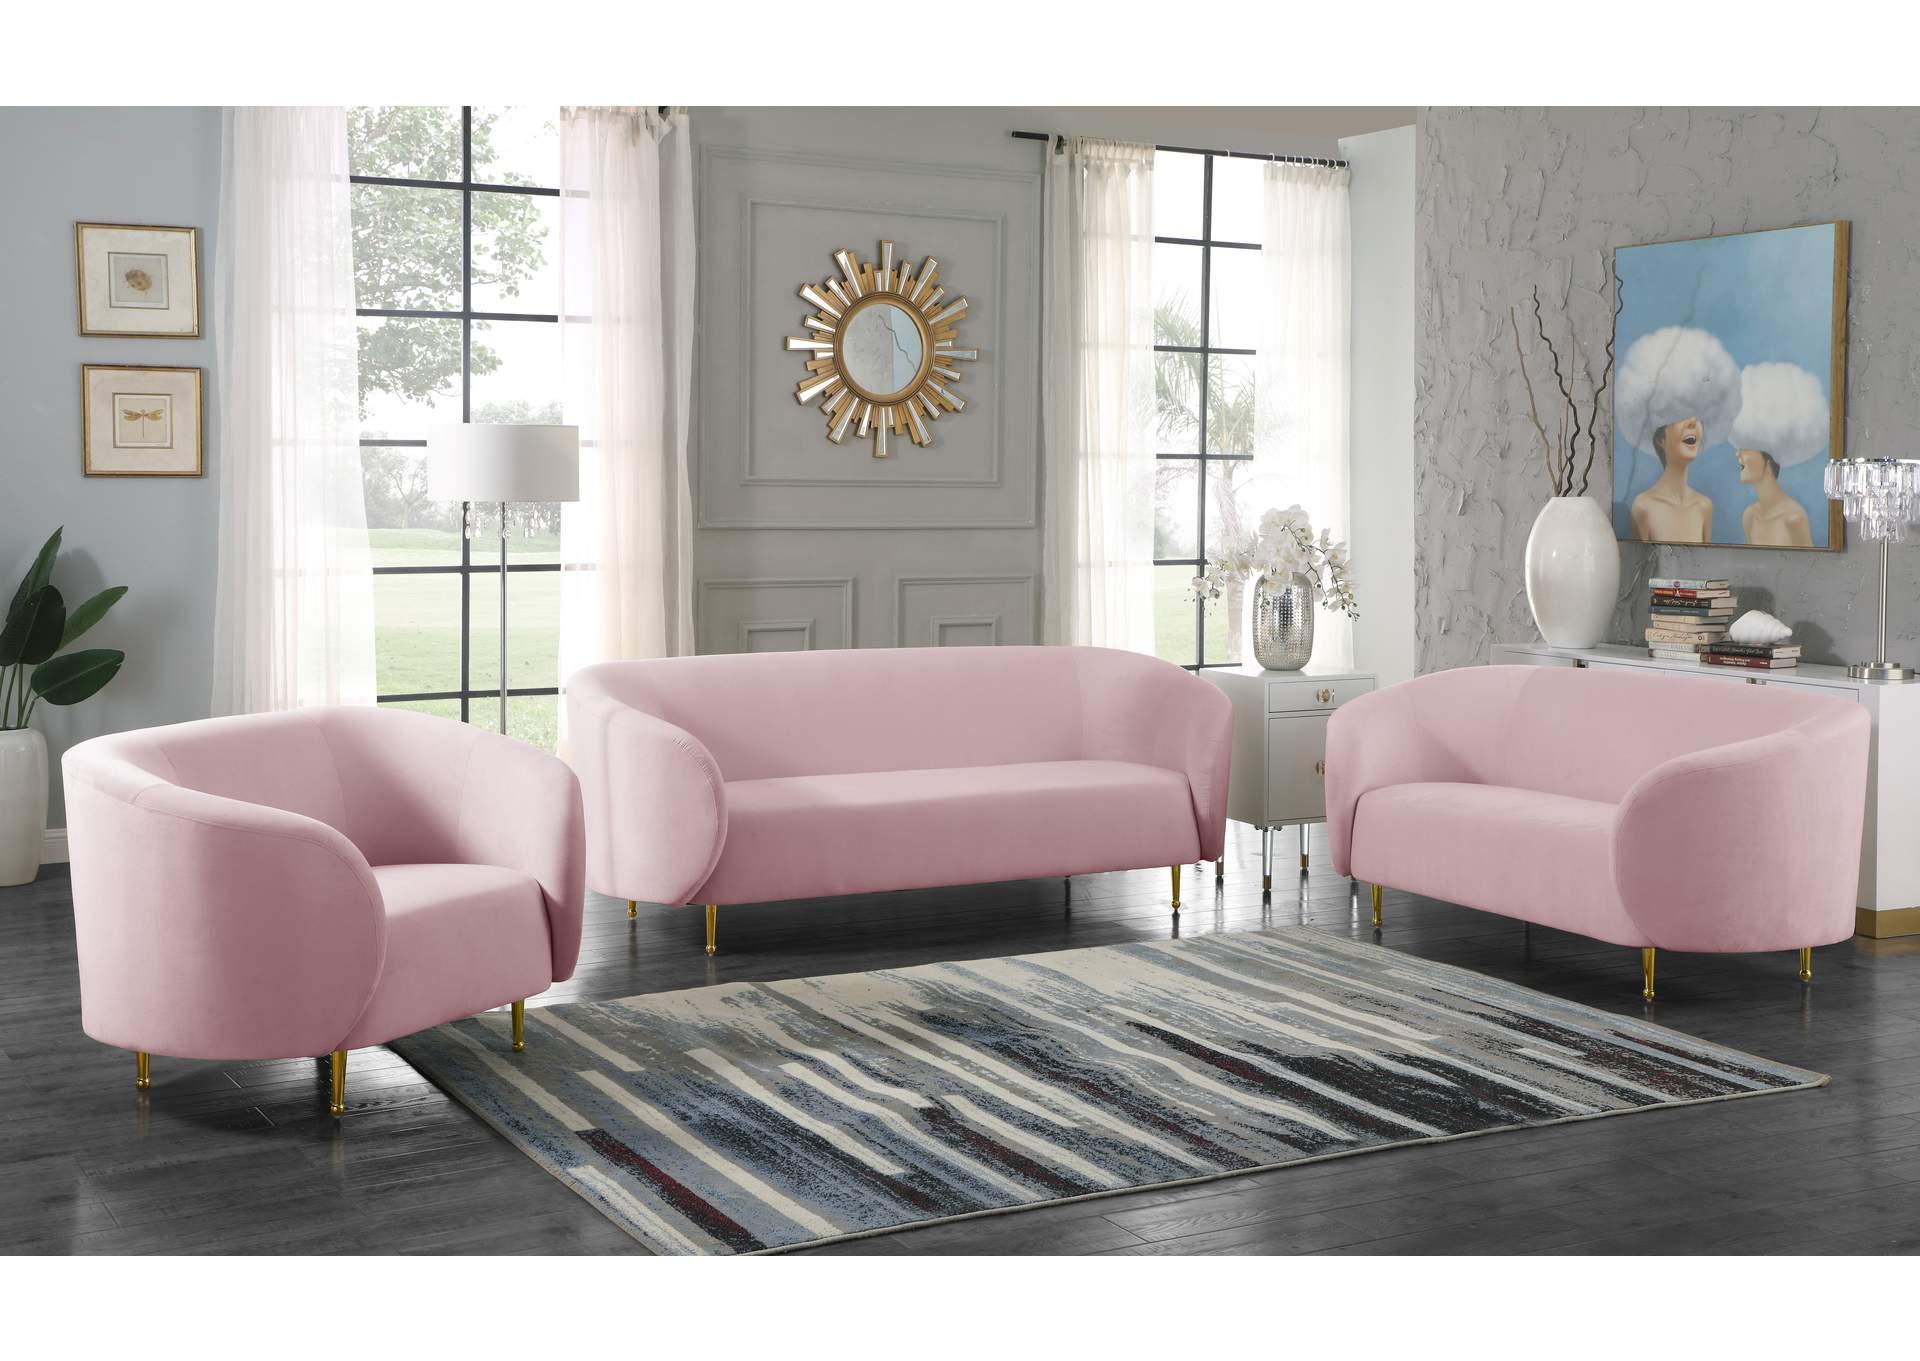 Lavilla Pink Velvet Sofa And Loveseat Kirk Imports